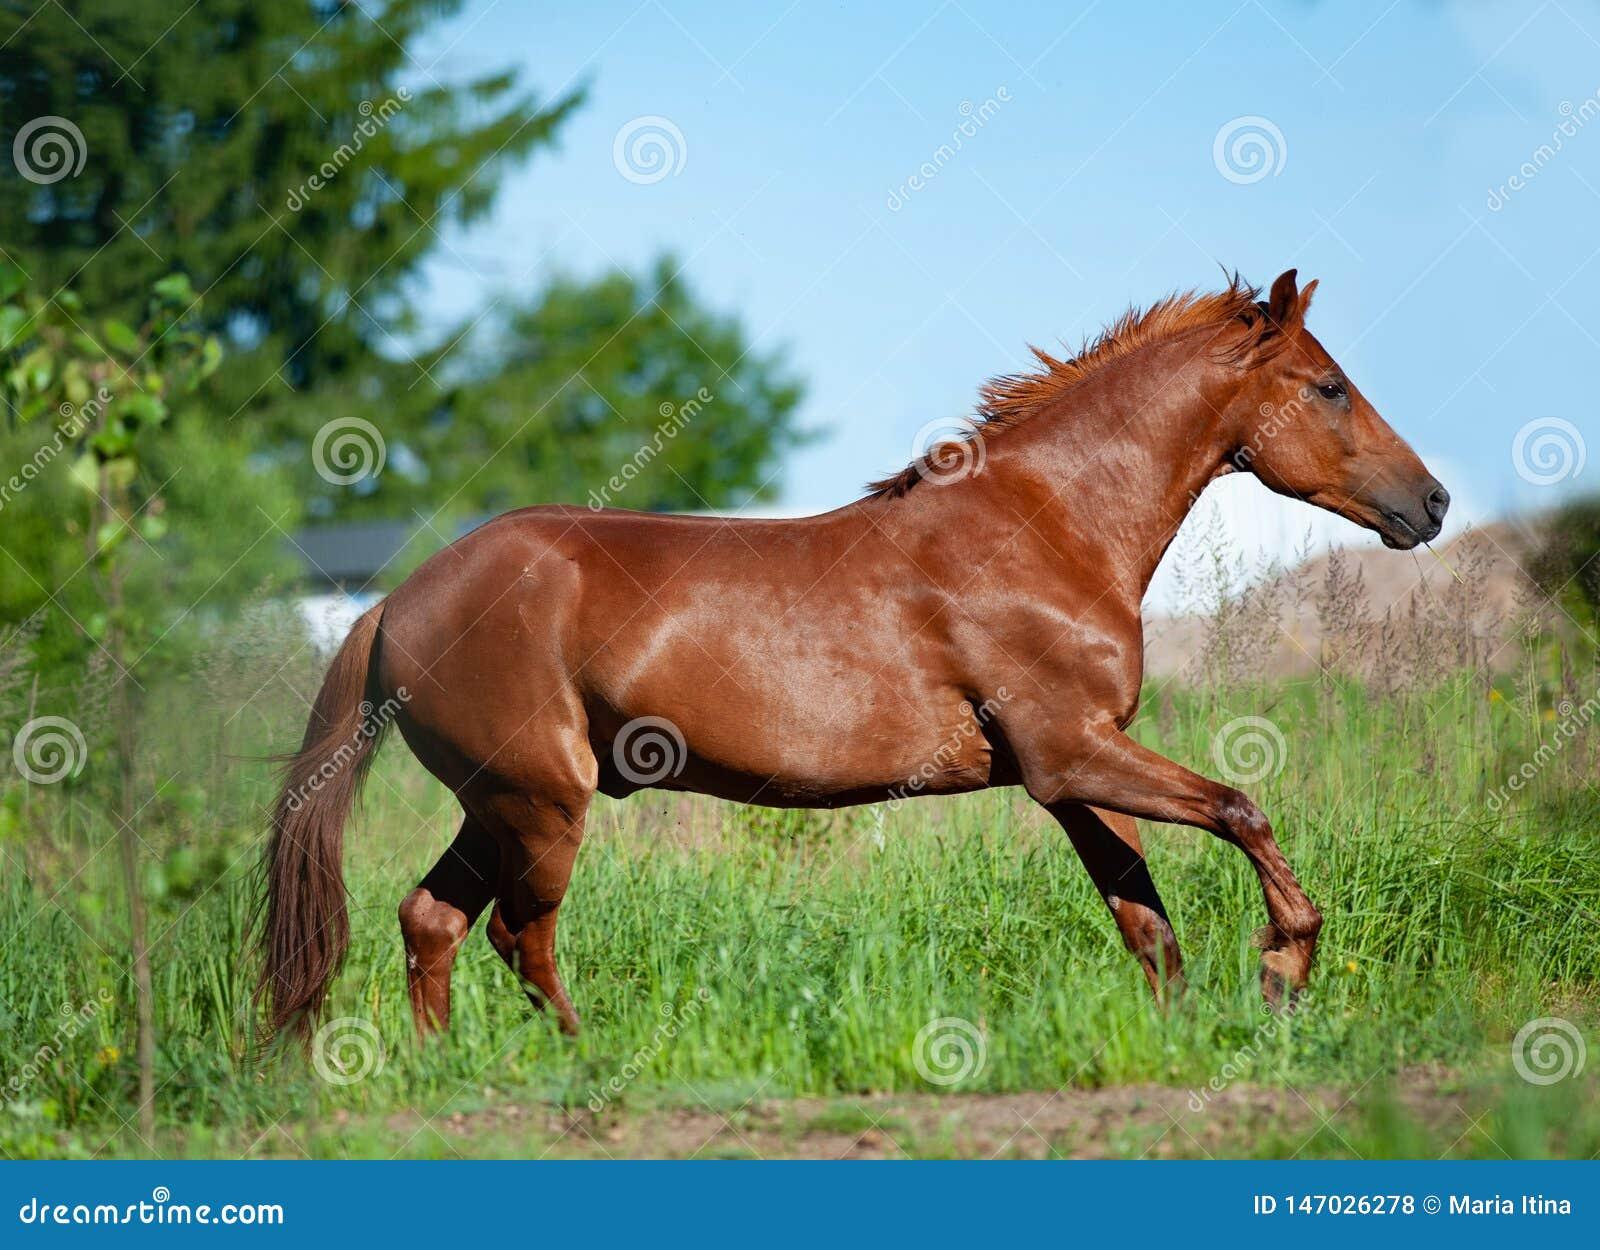 Chestnut Horse Running In Freedom Stock Photo - Image of ... - photo#14